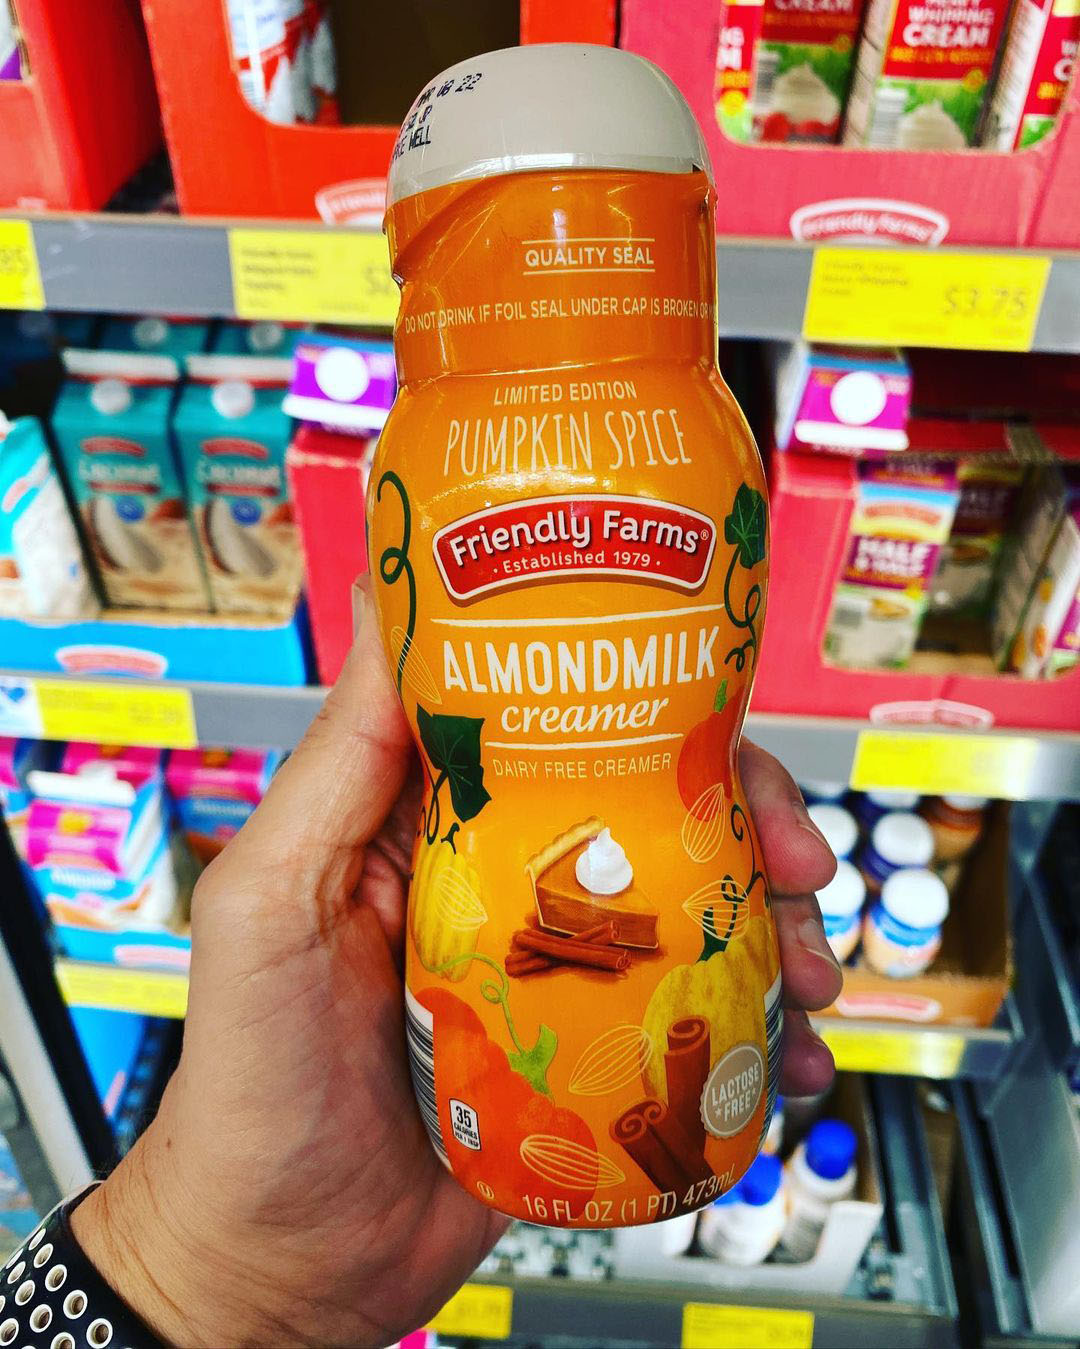 Almondmilk Creamer